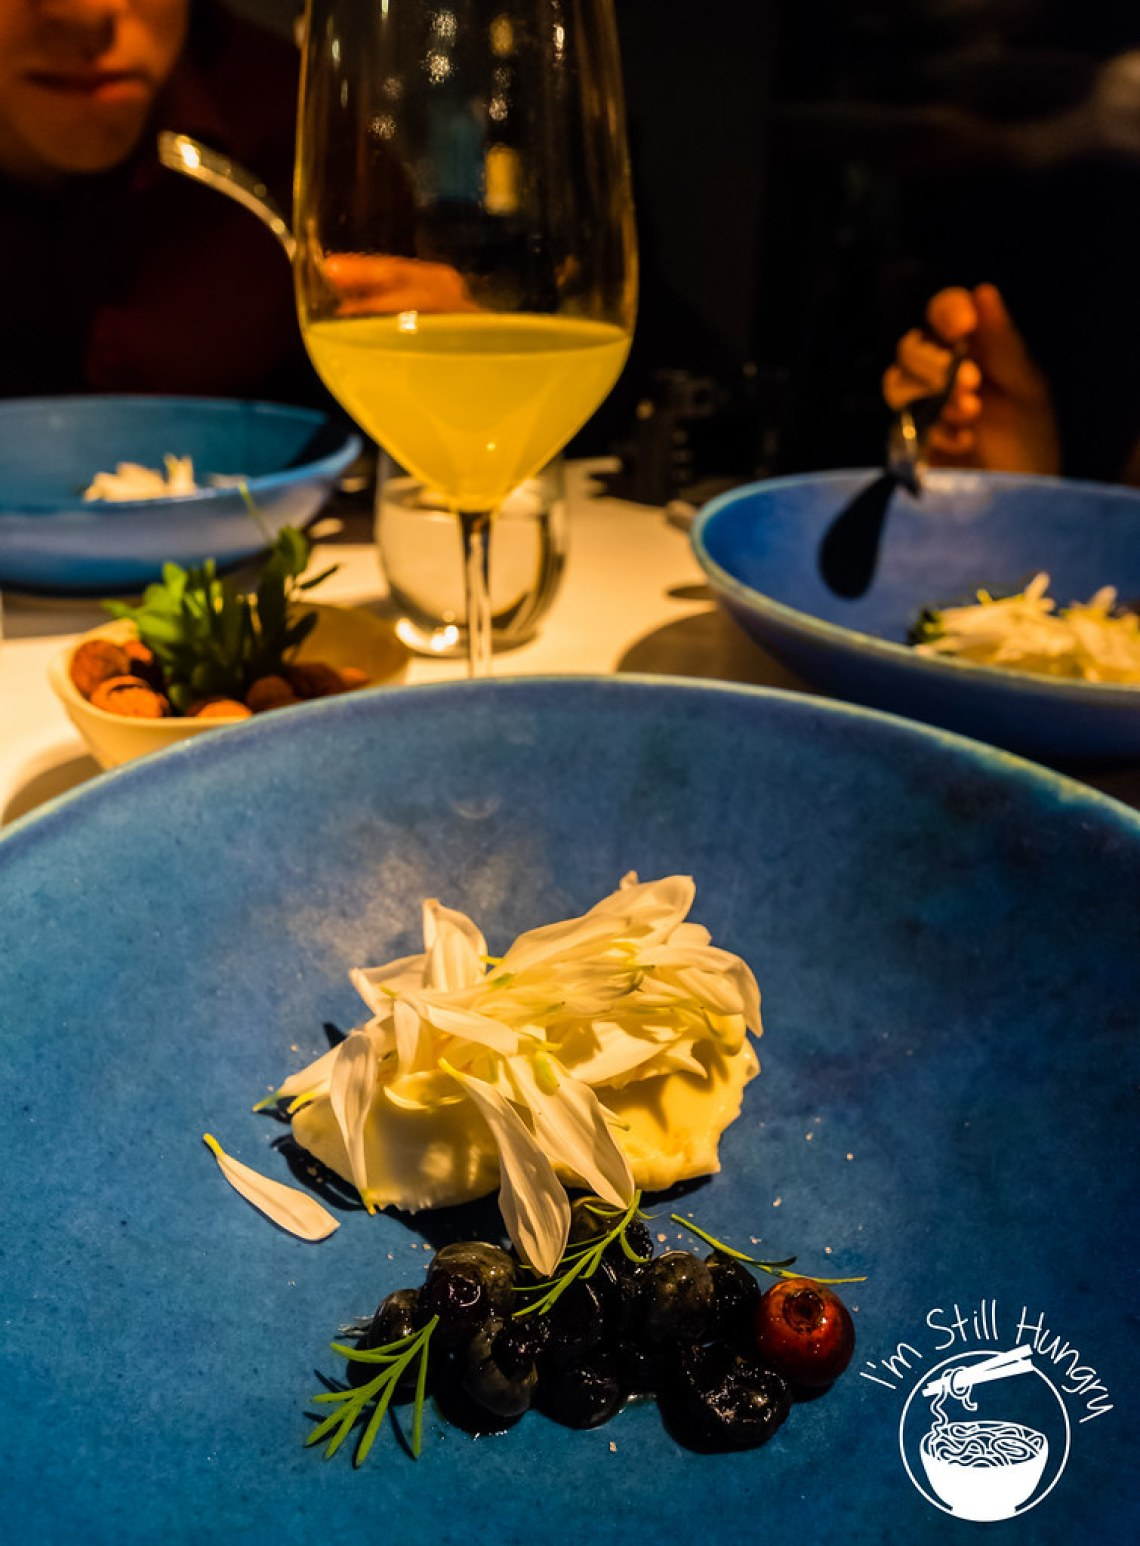 Blueberries, vinegar & fresh cheese Attica